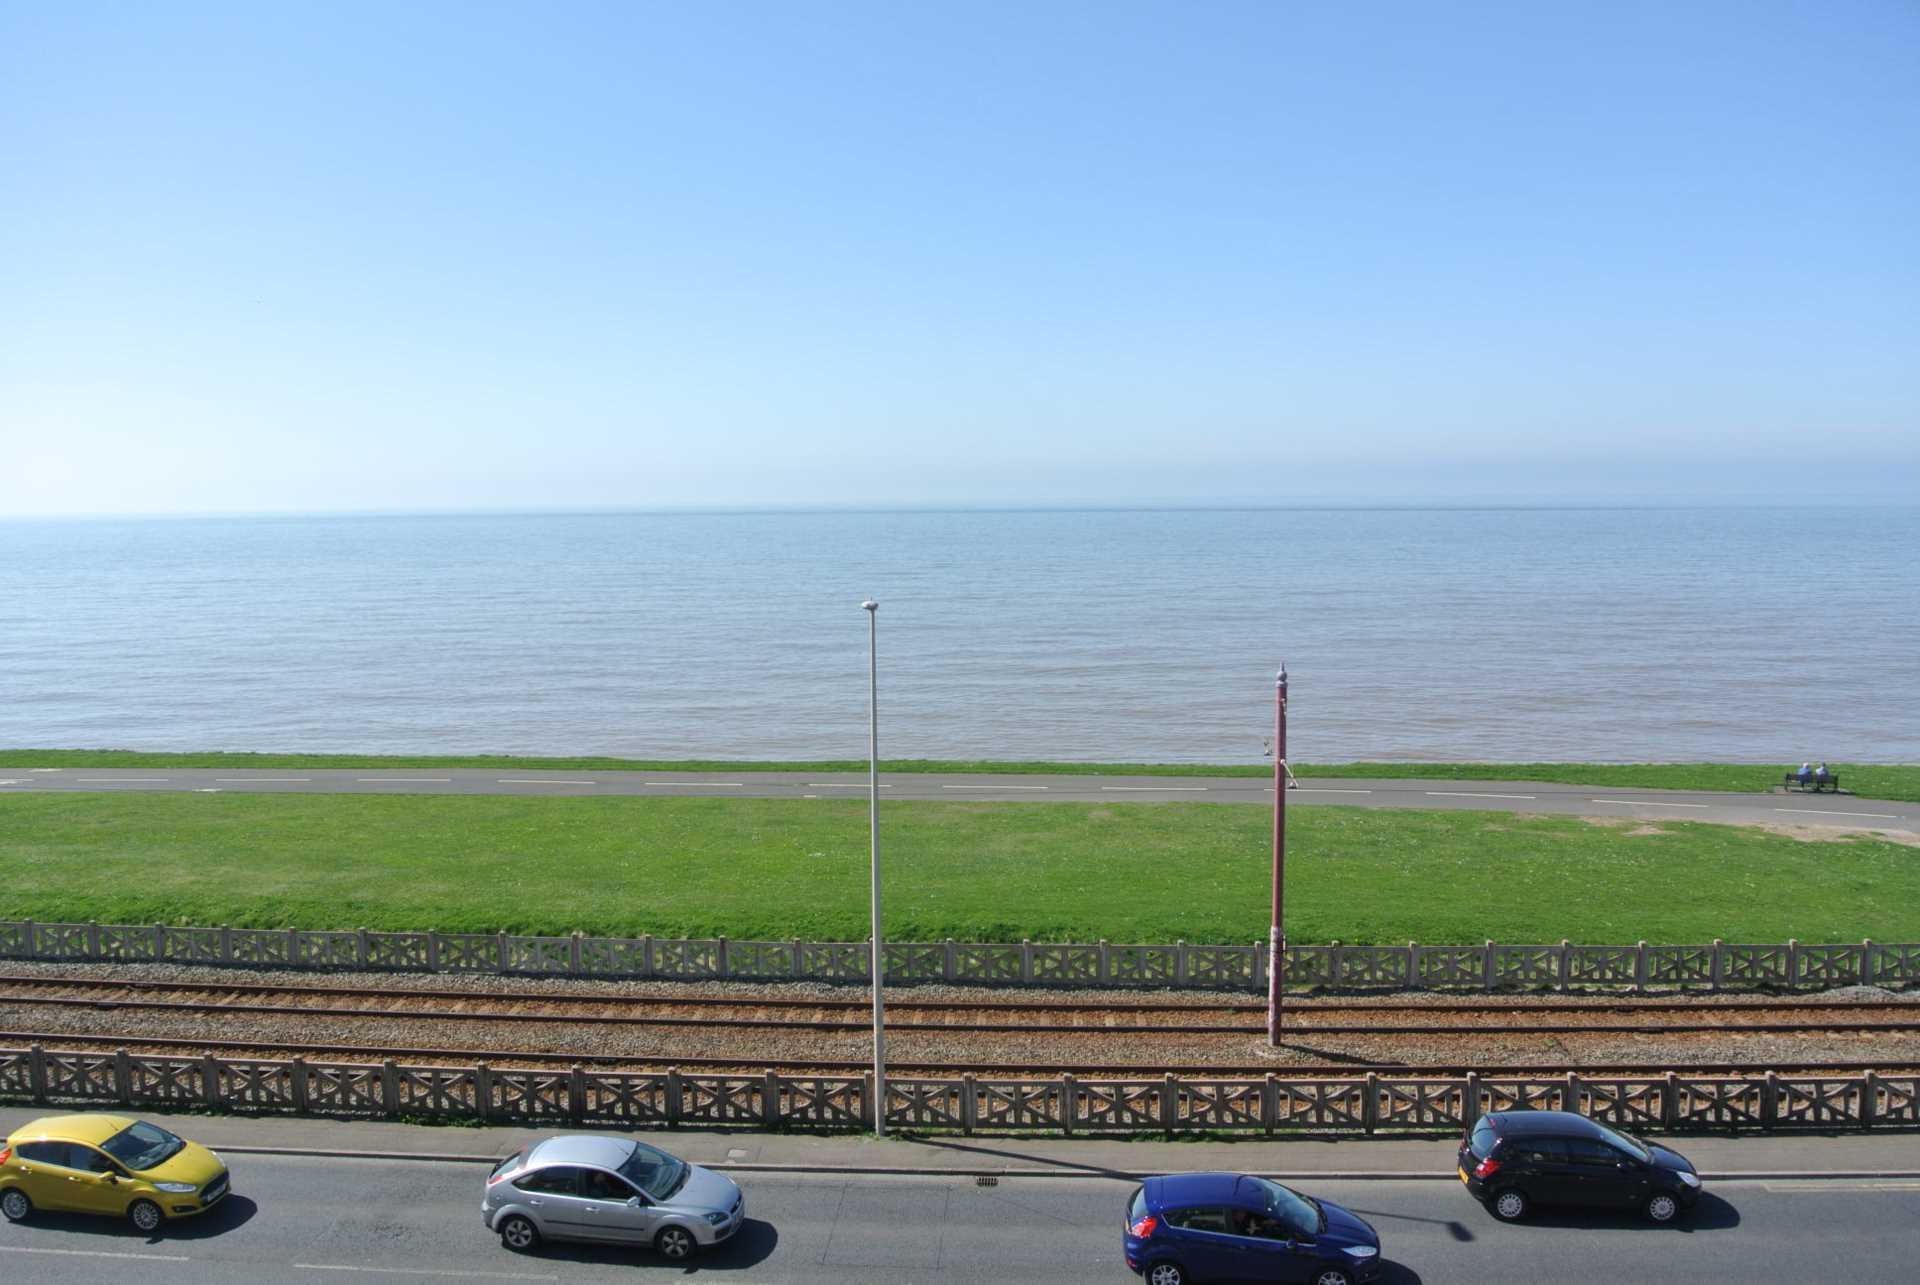 Dales View, Queens Promenade, Blackpool, FY2 9AB, Image 3